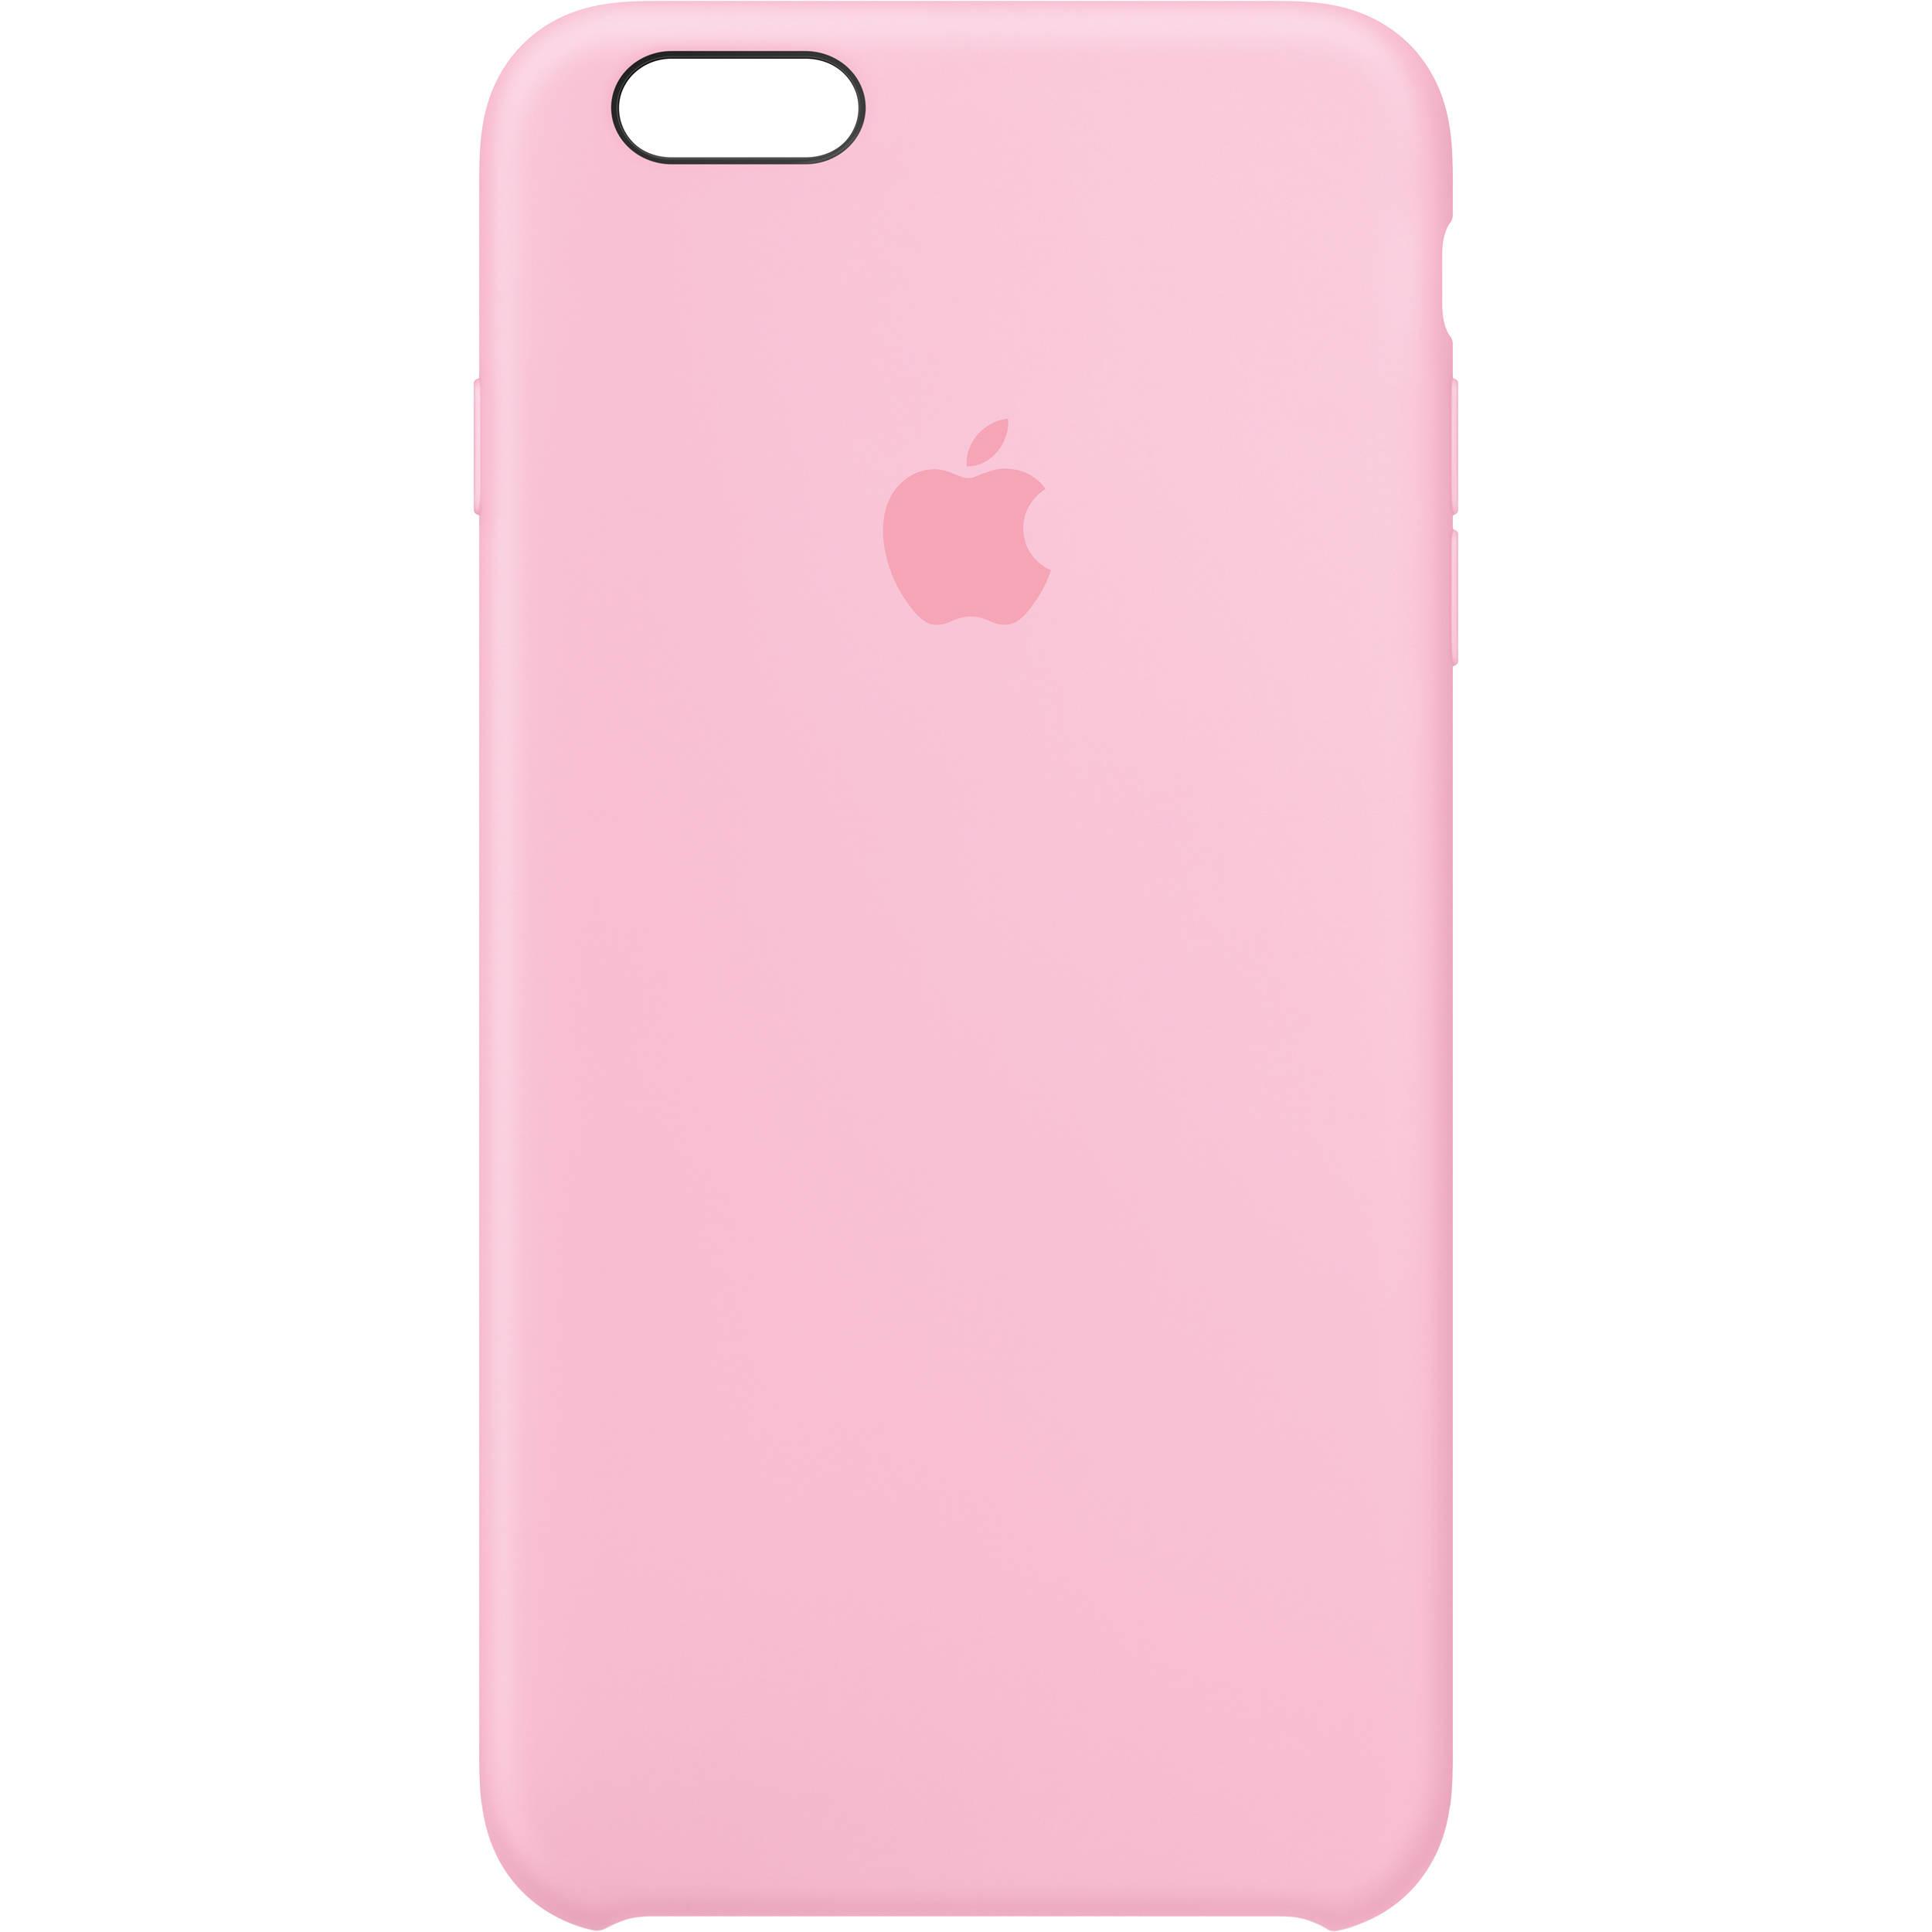 apple iphone 6 plus 6s plus silicone case light pink. Black Bedroom Furniture Sets. Home Design Ideas